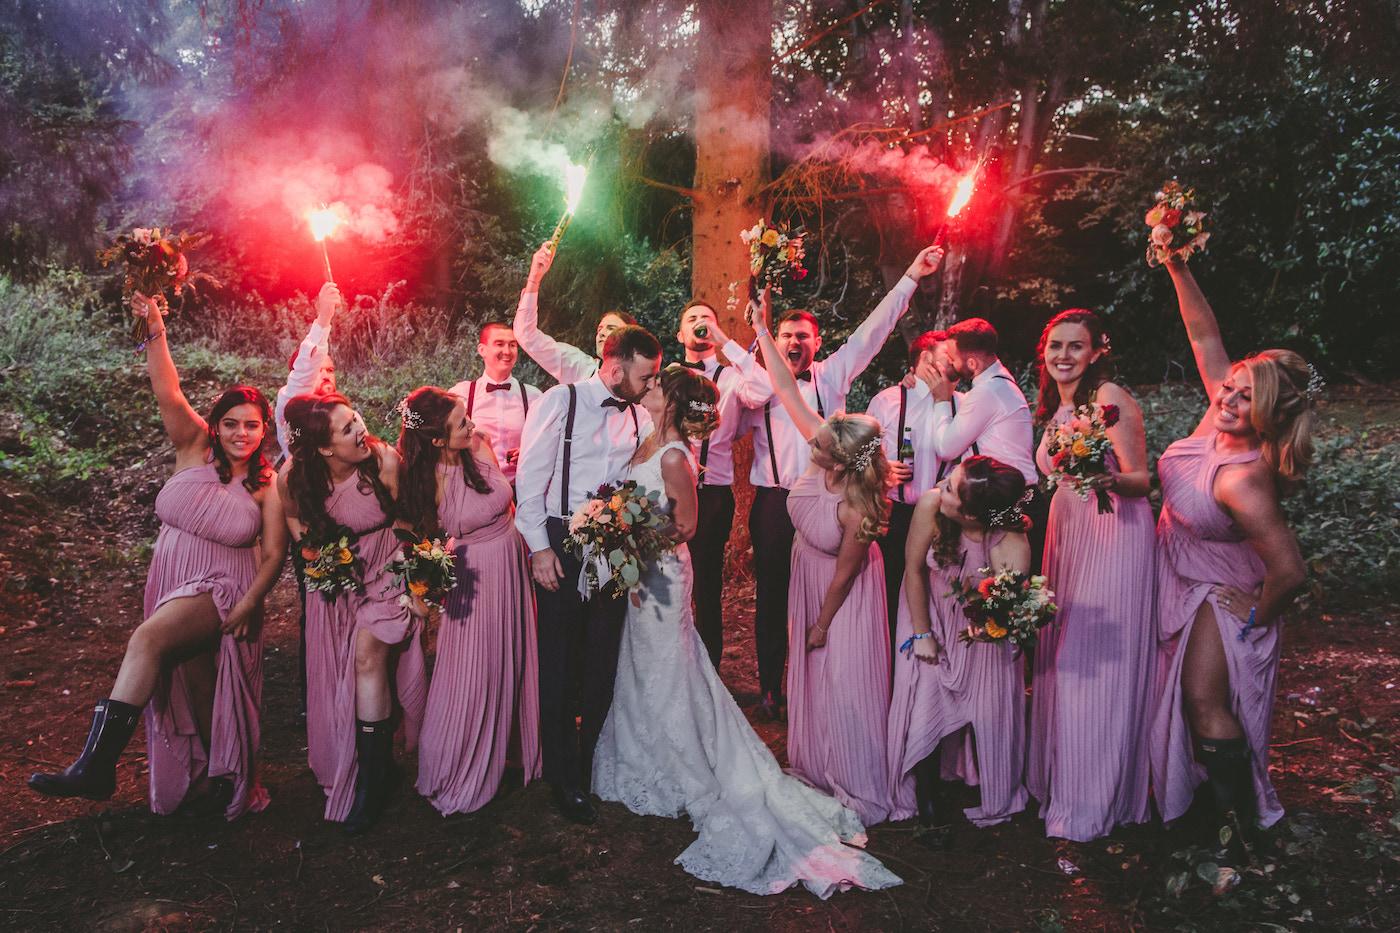 kellyfest festival wedding flare wedfest